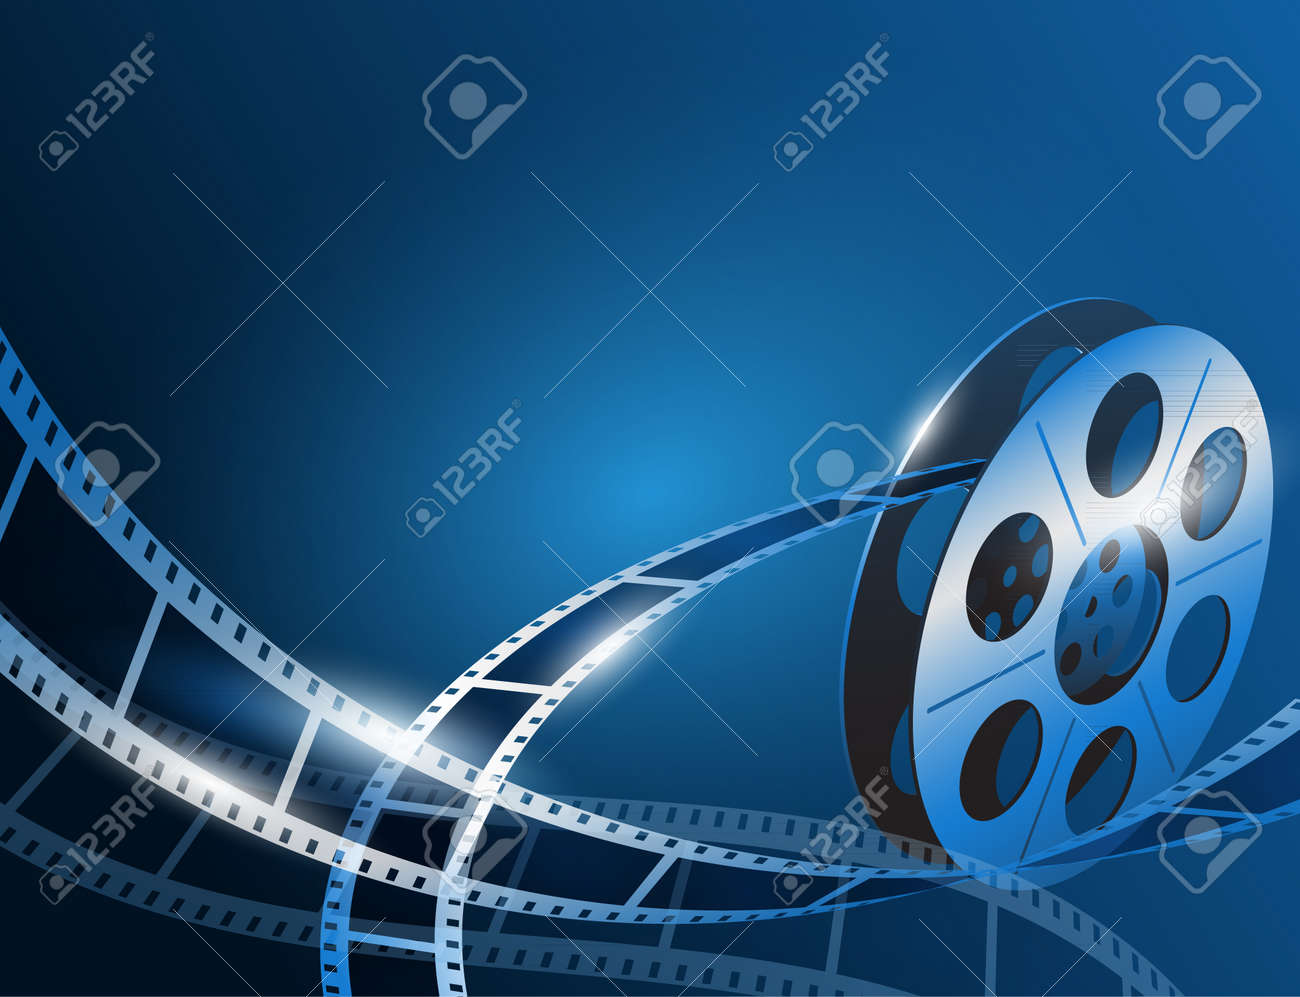 Vector illustration of a film stripe reel on shiny blue movie background - 53756512